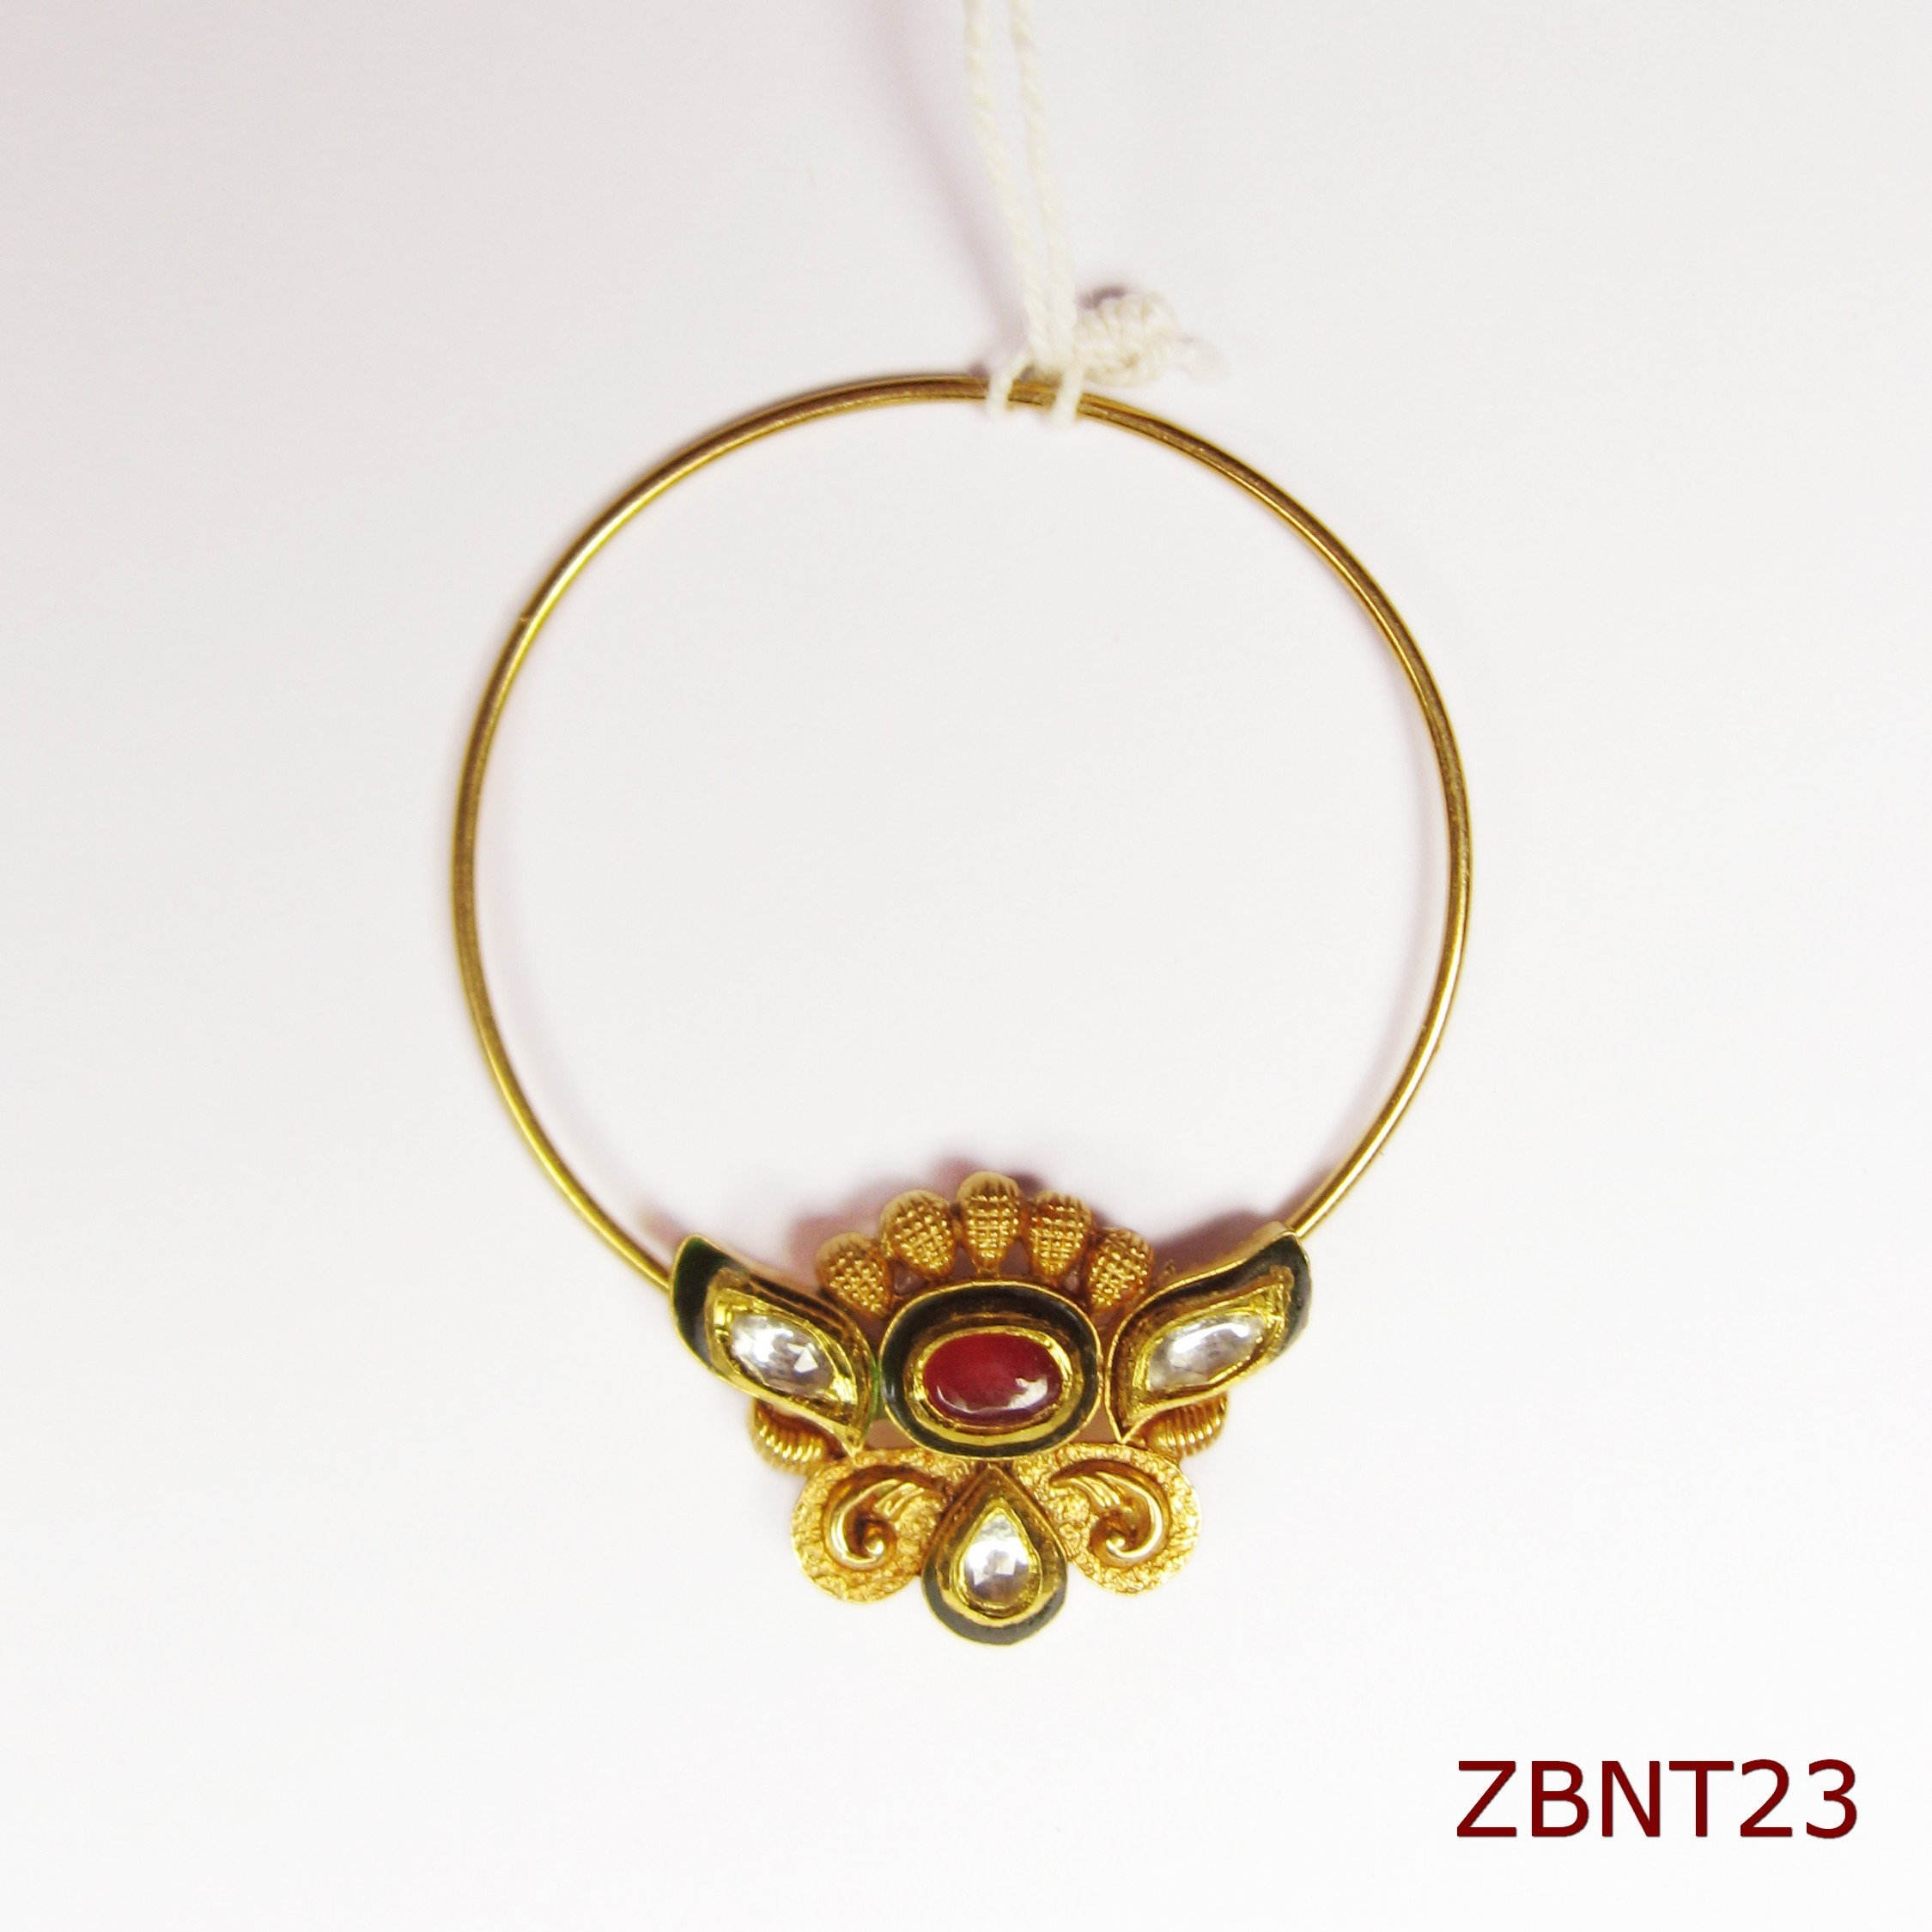 ZBNT23